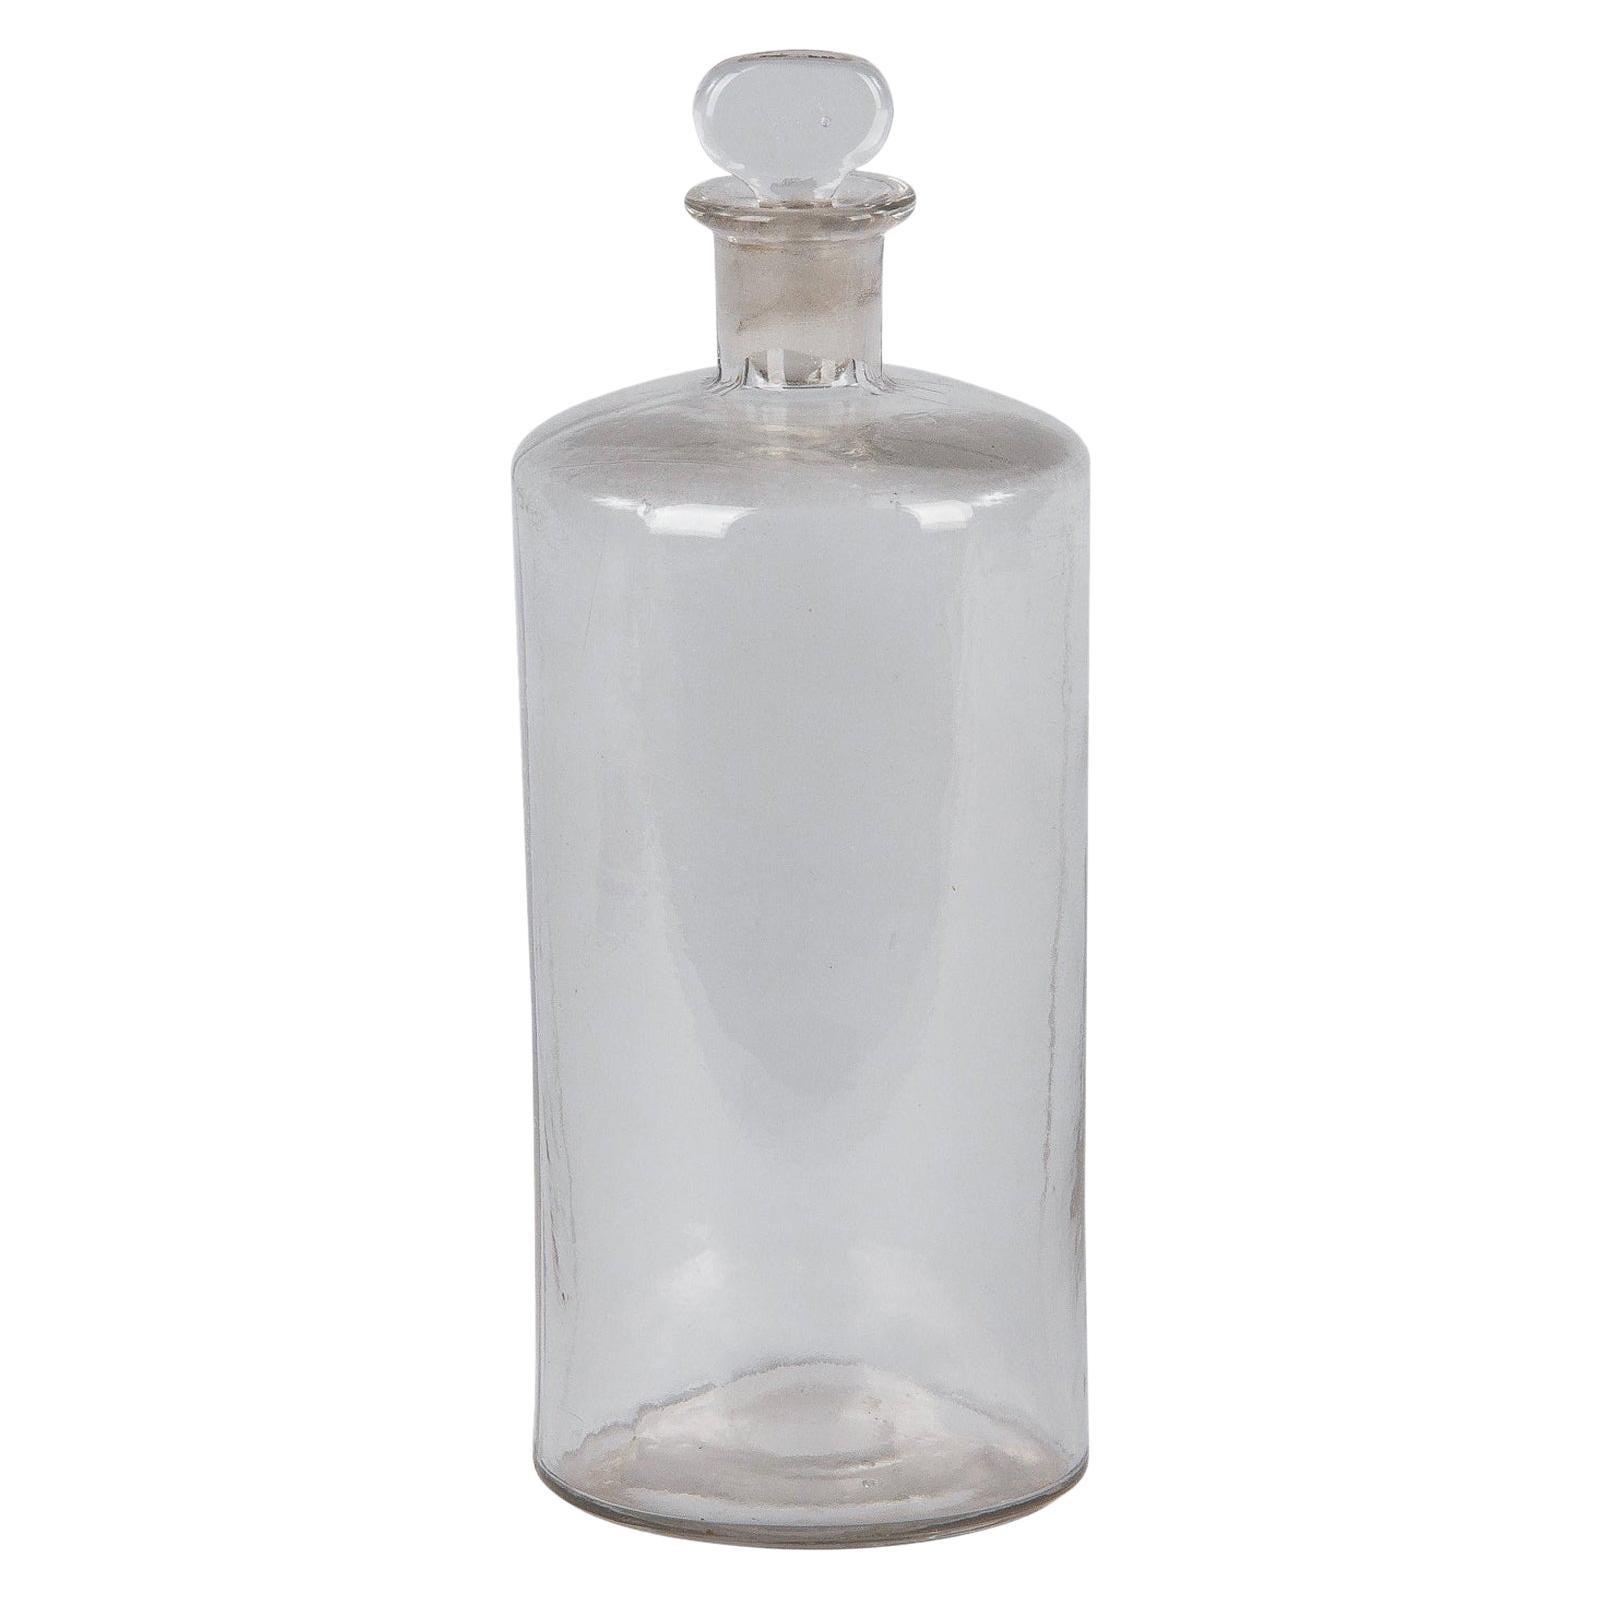 French Pharmacy Glass Jar, Early 1900s